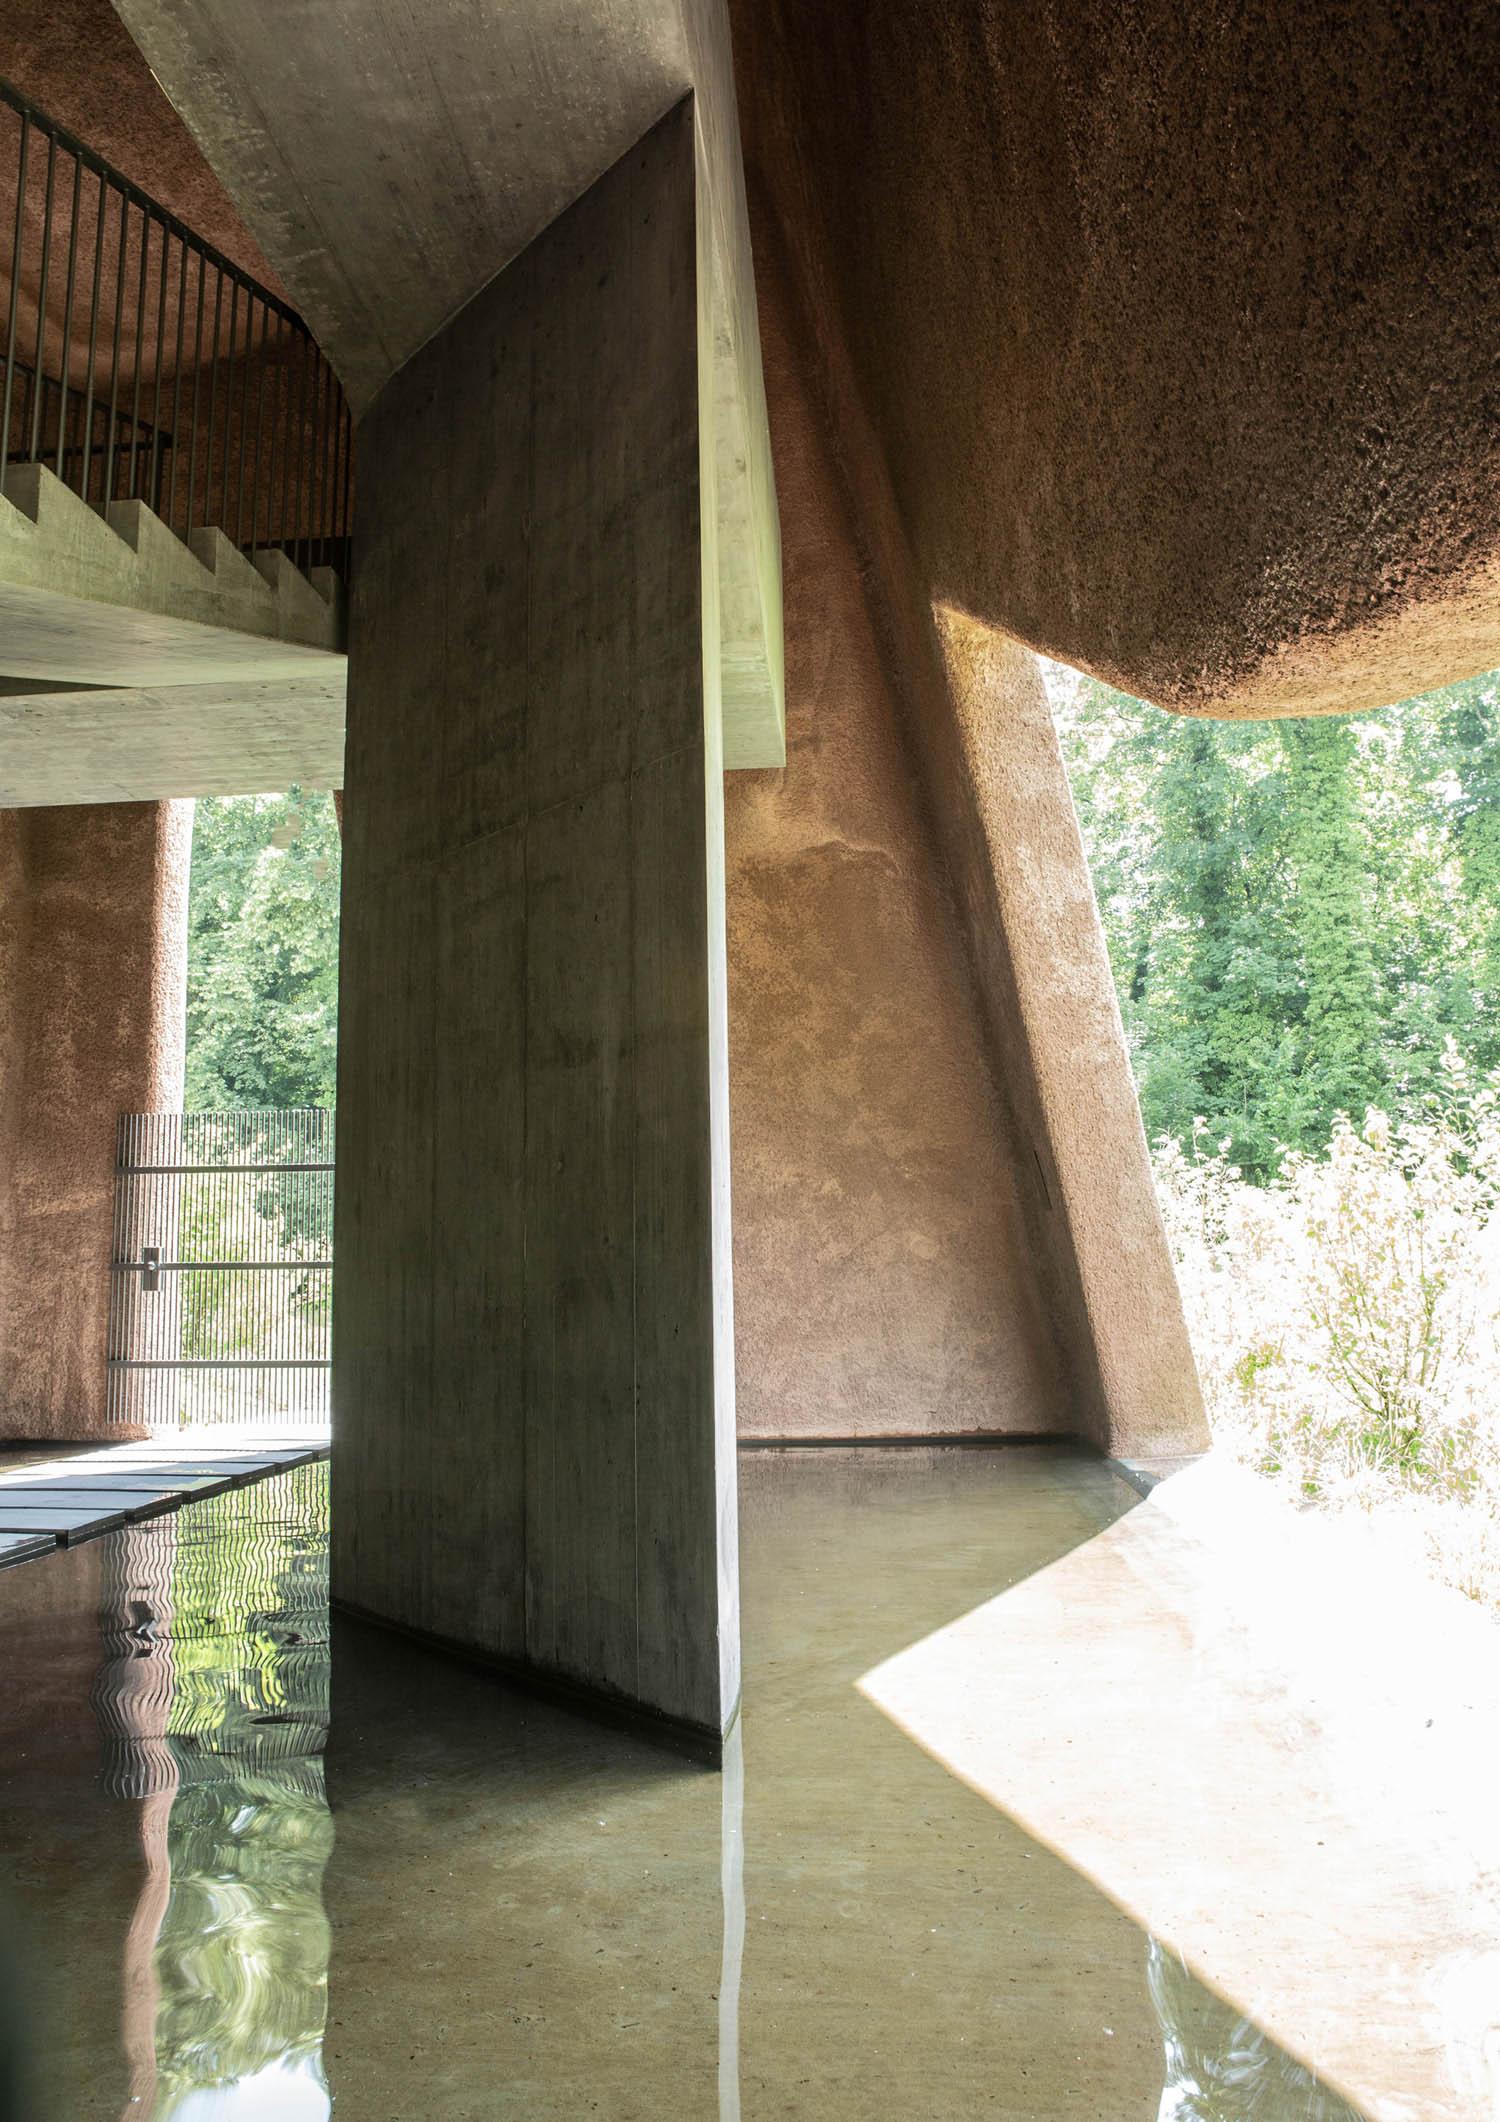 Interior view Aaron Kohler